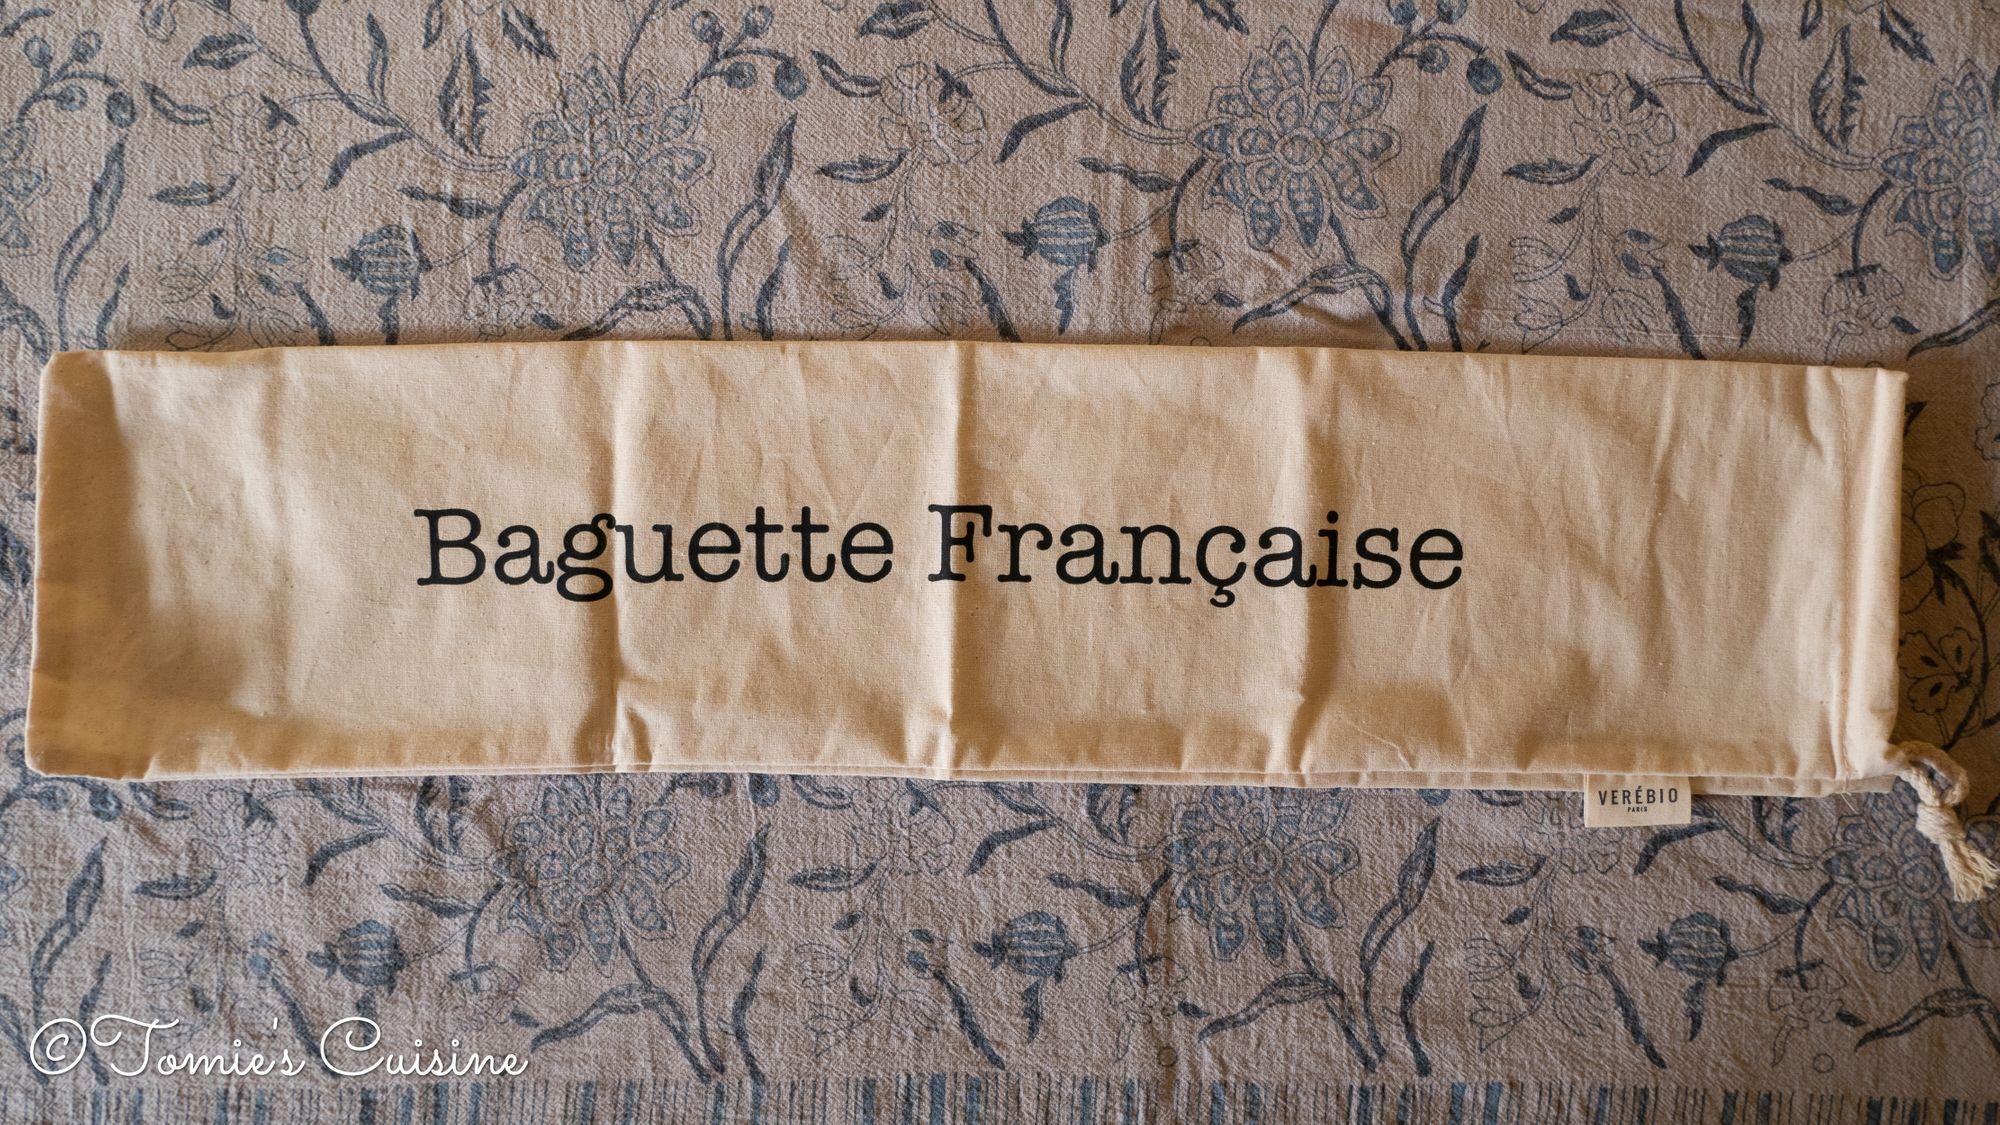 The baguette bag!